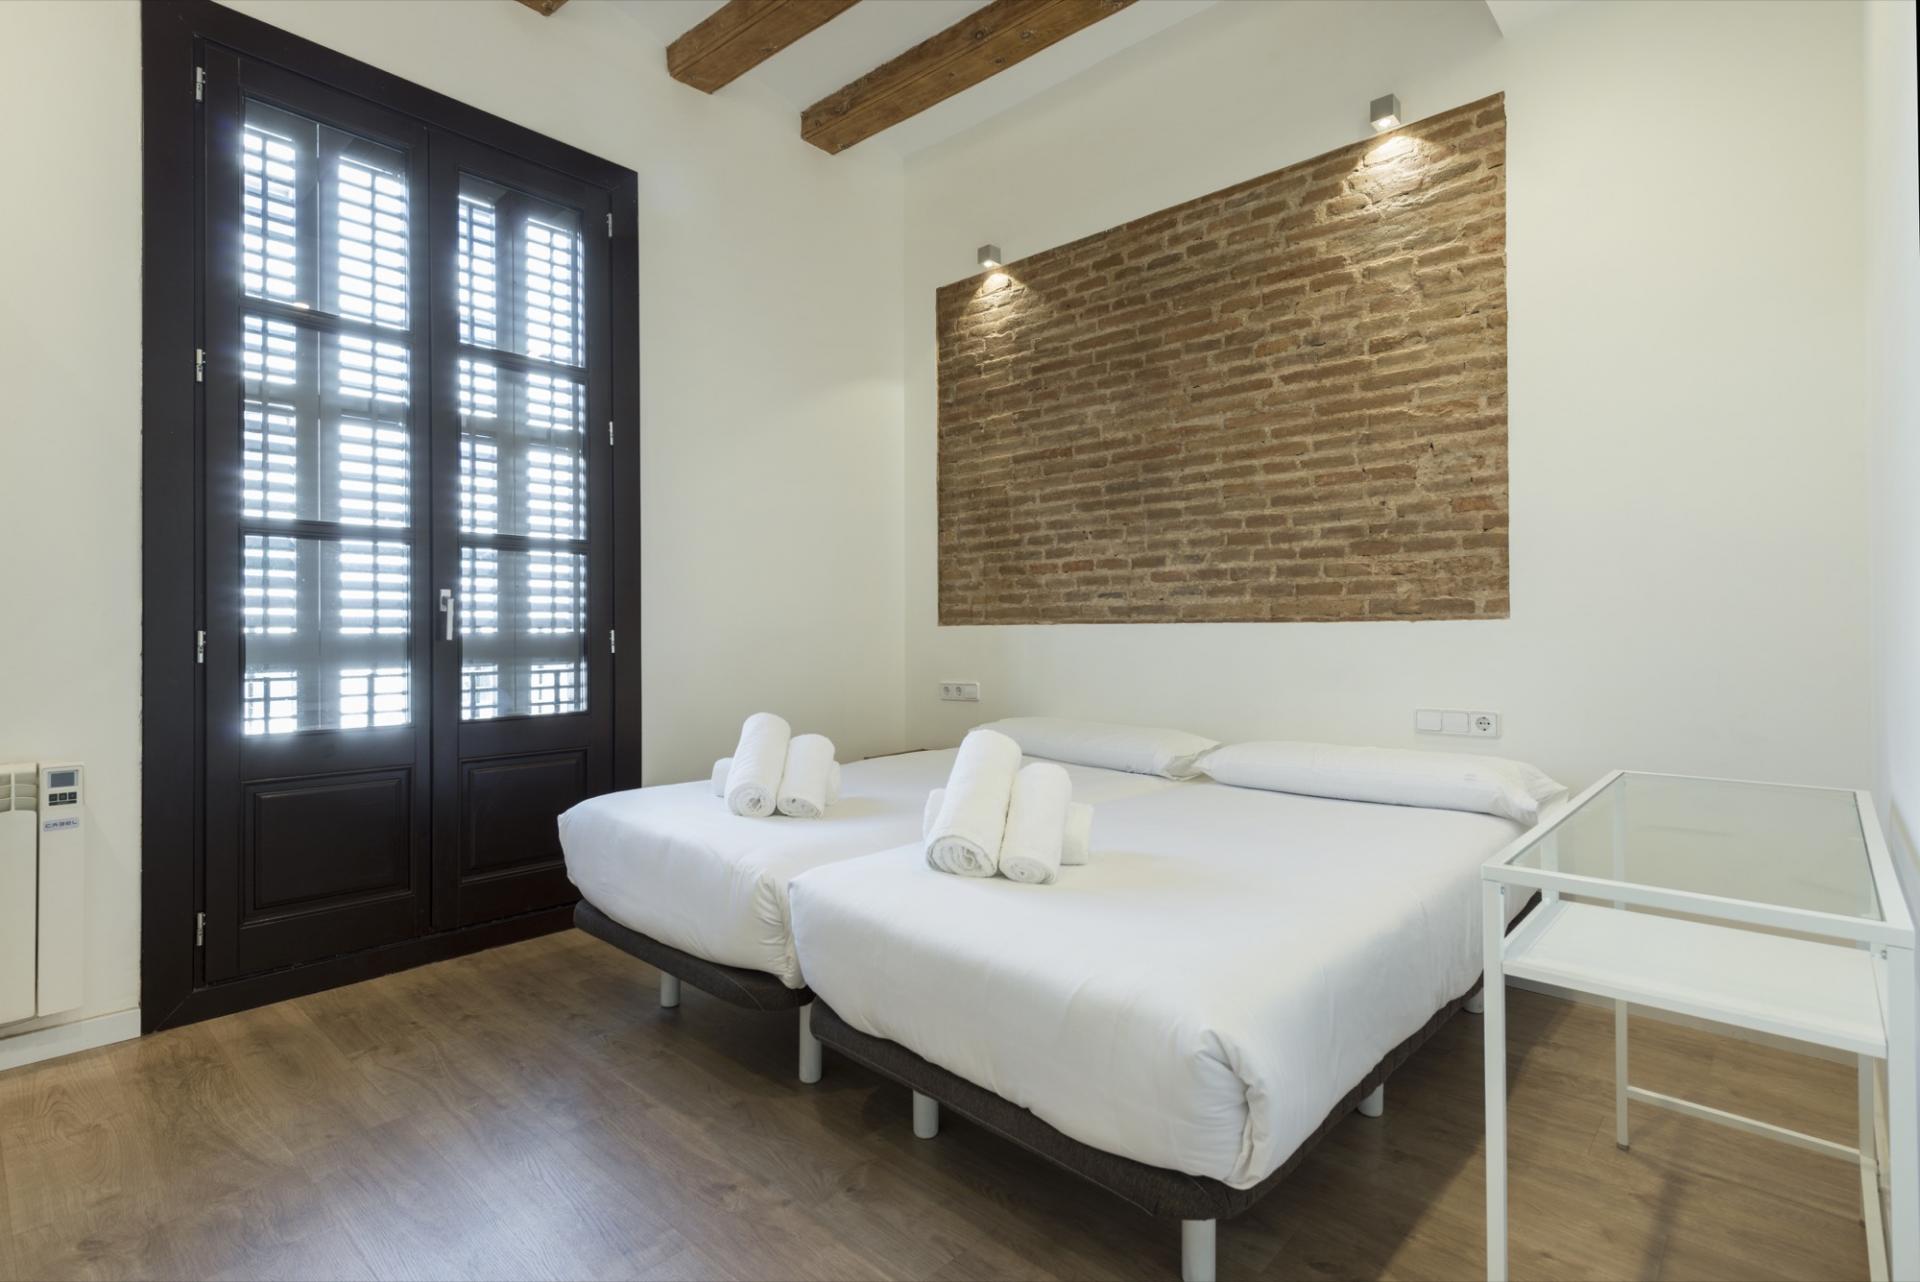 Bed at Pelayo Suites, El Raval, Barcelona - Citybase Apartments